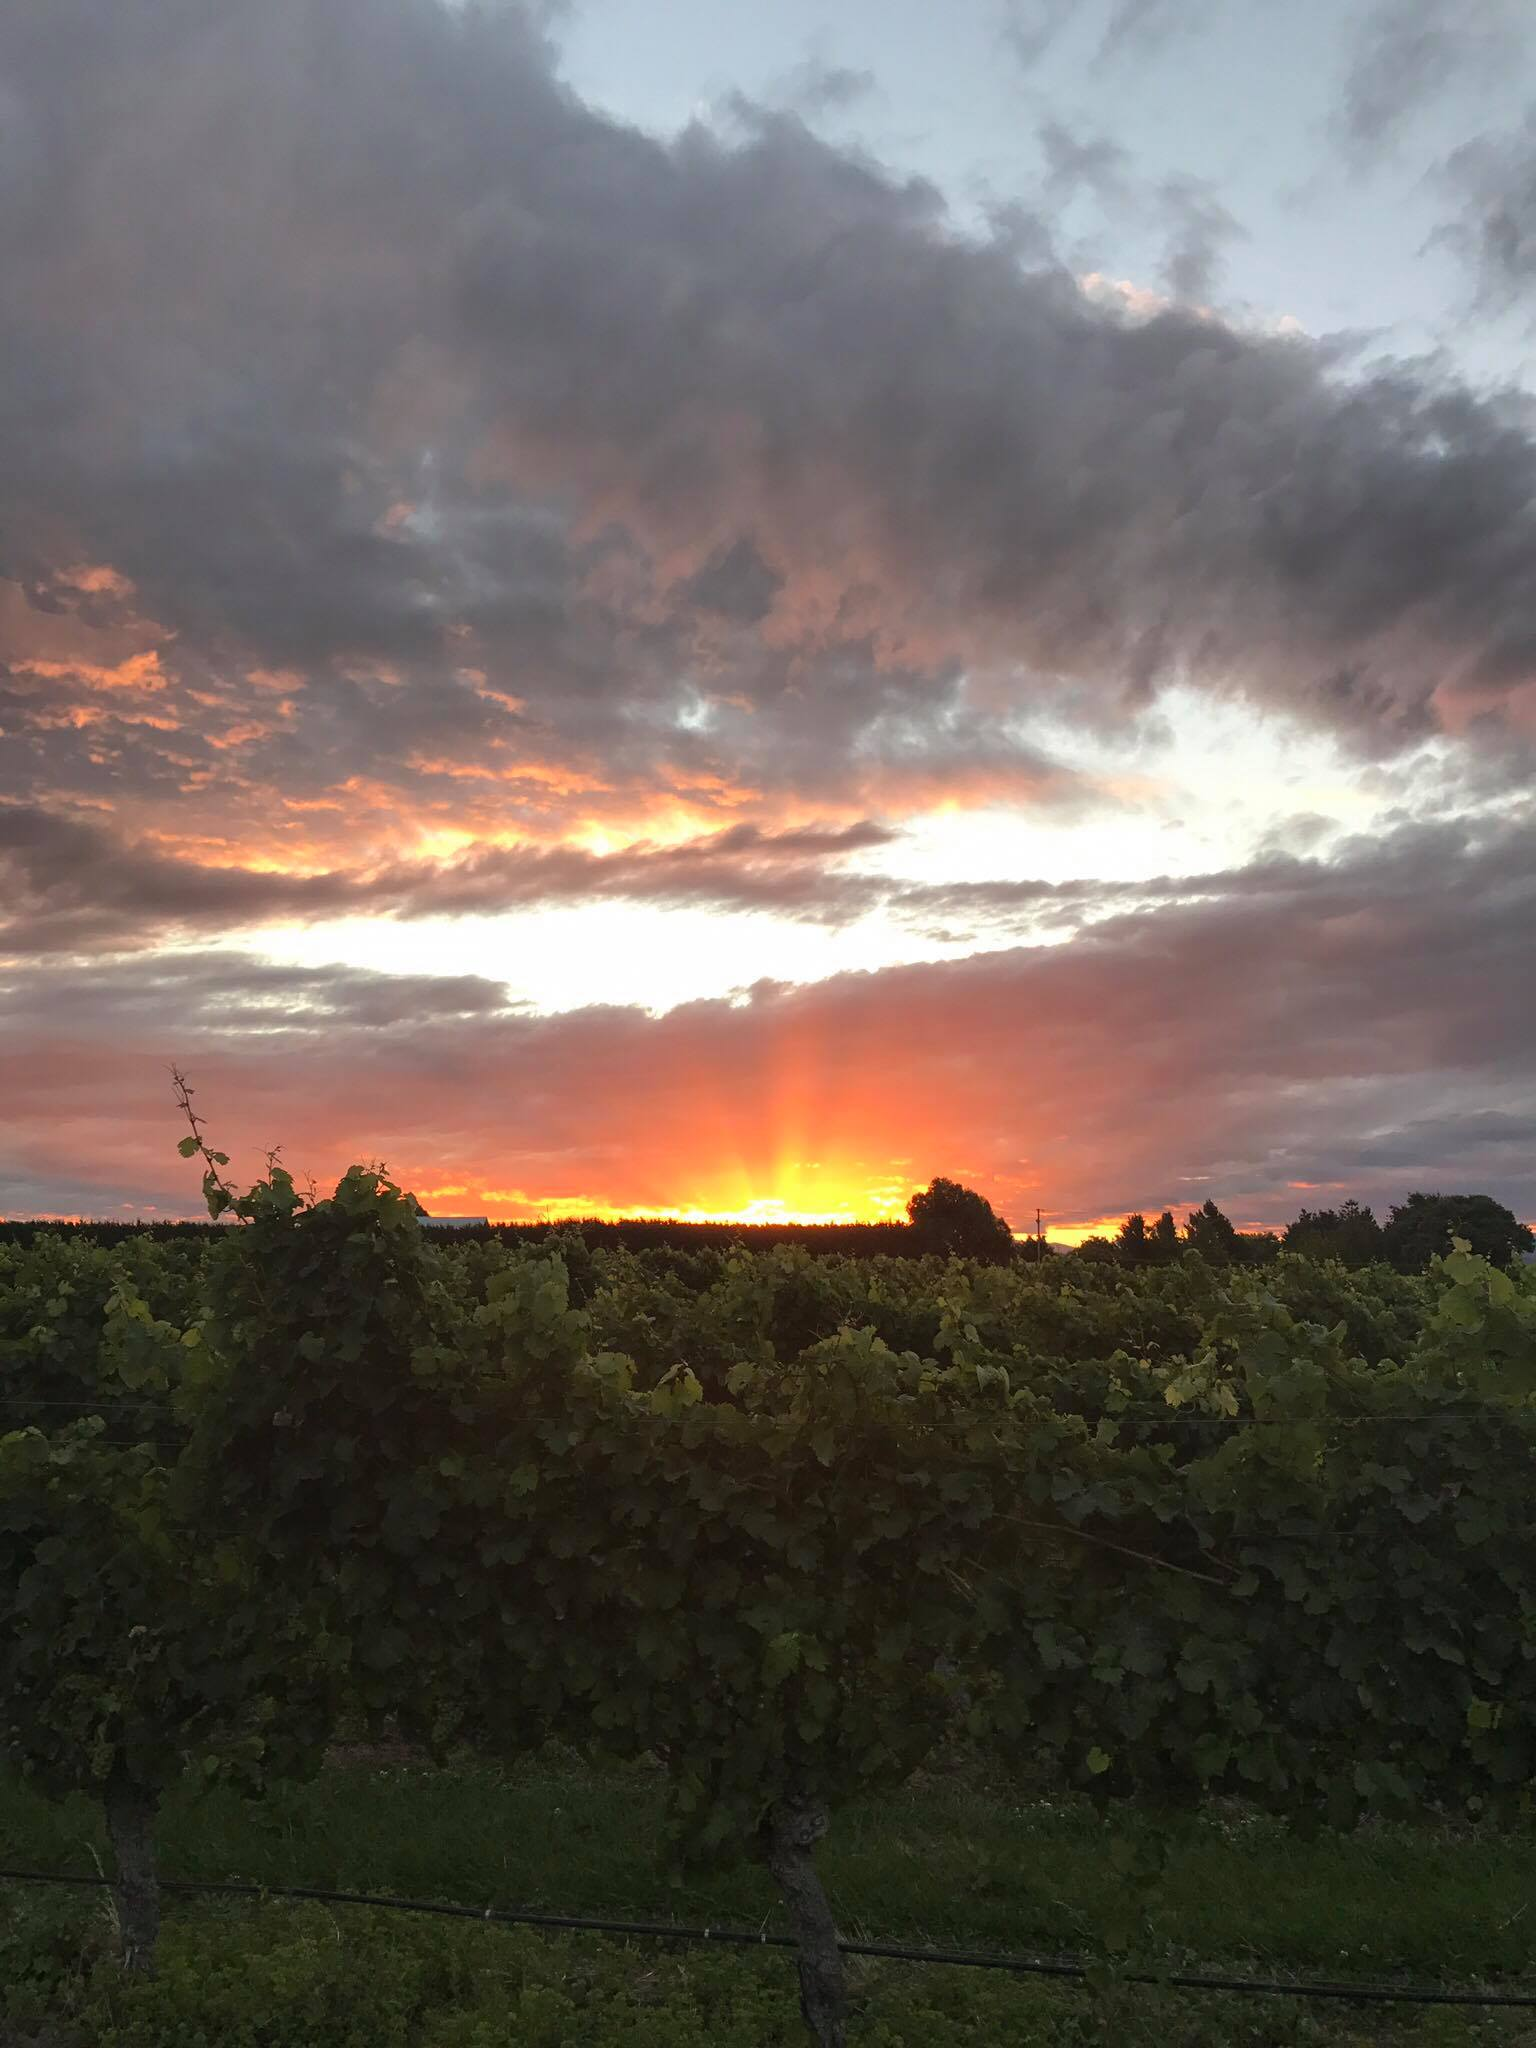 Marlborough sunset over the vines at the Allan Scott Vineyard